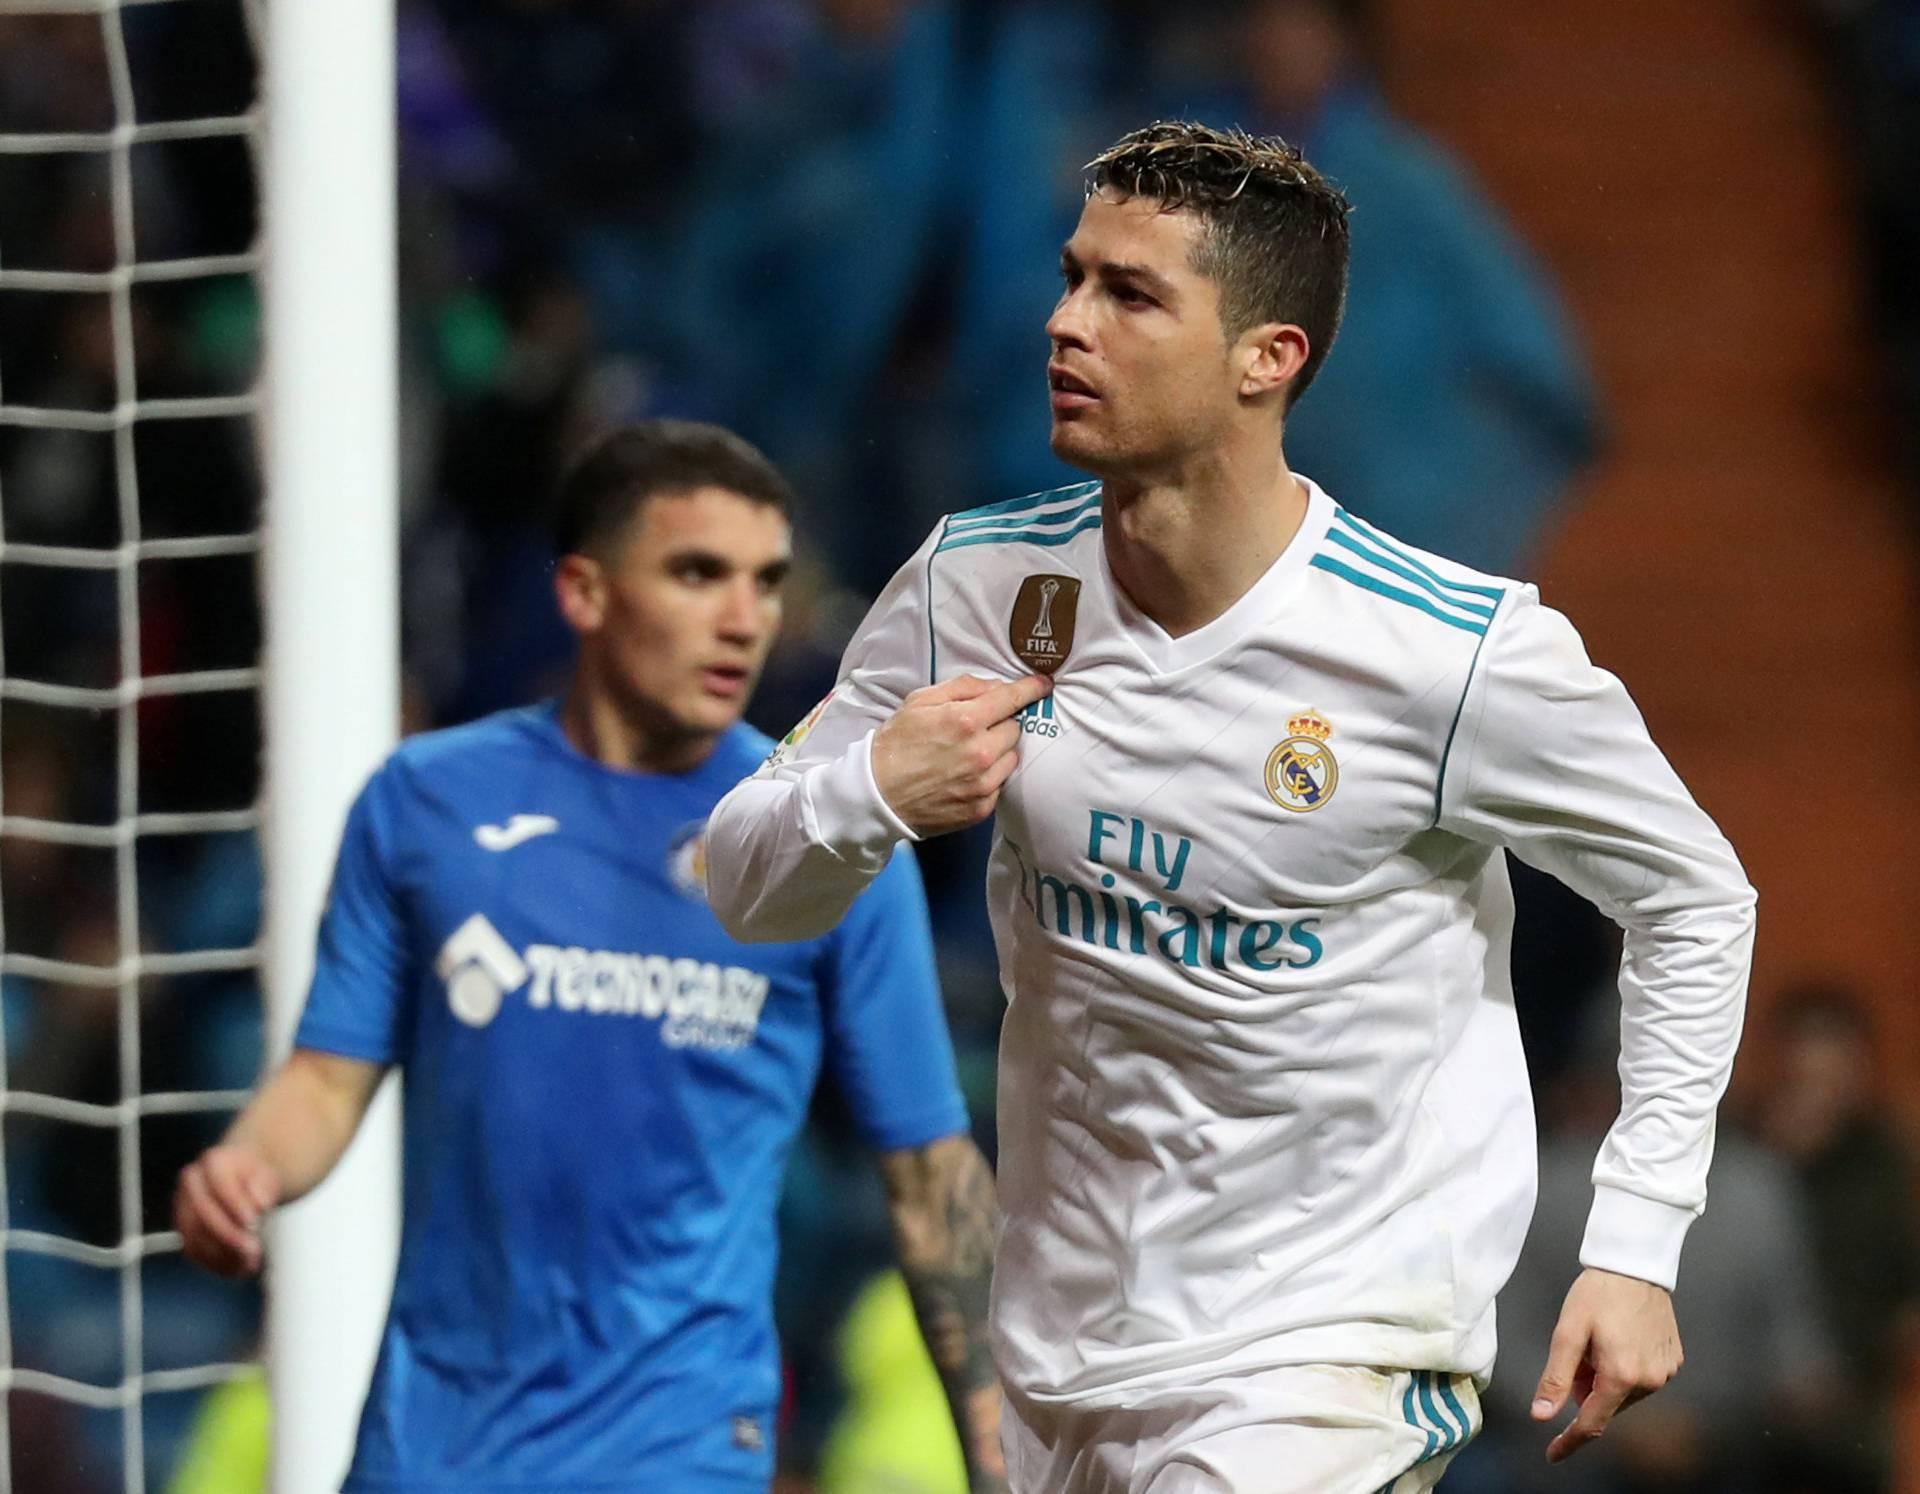 La Liga Santander - Real Madrid vs Getafe